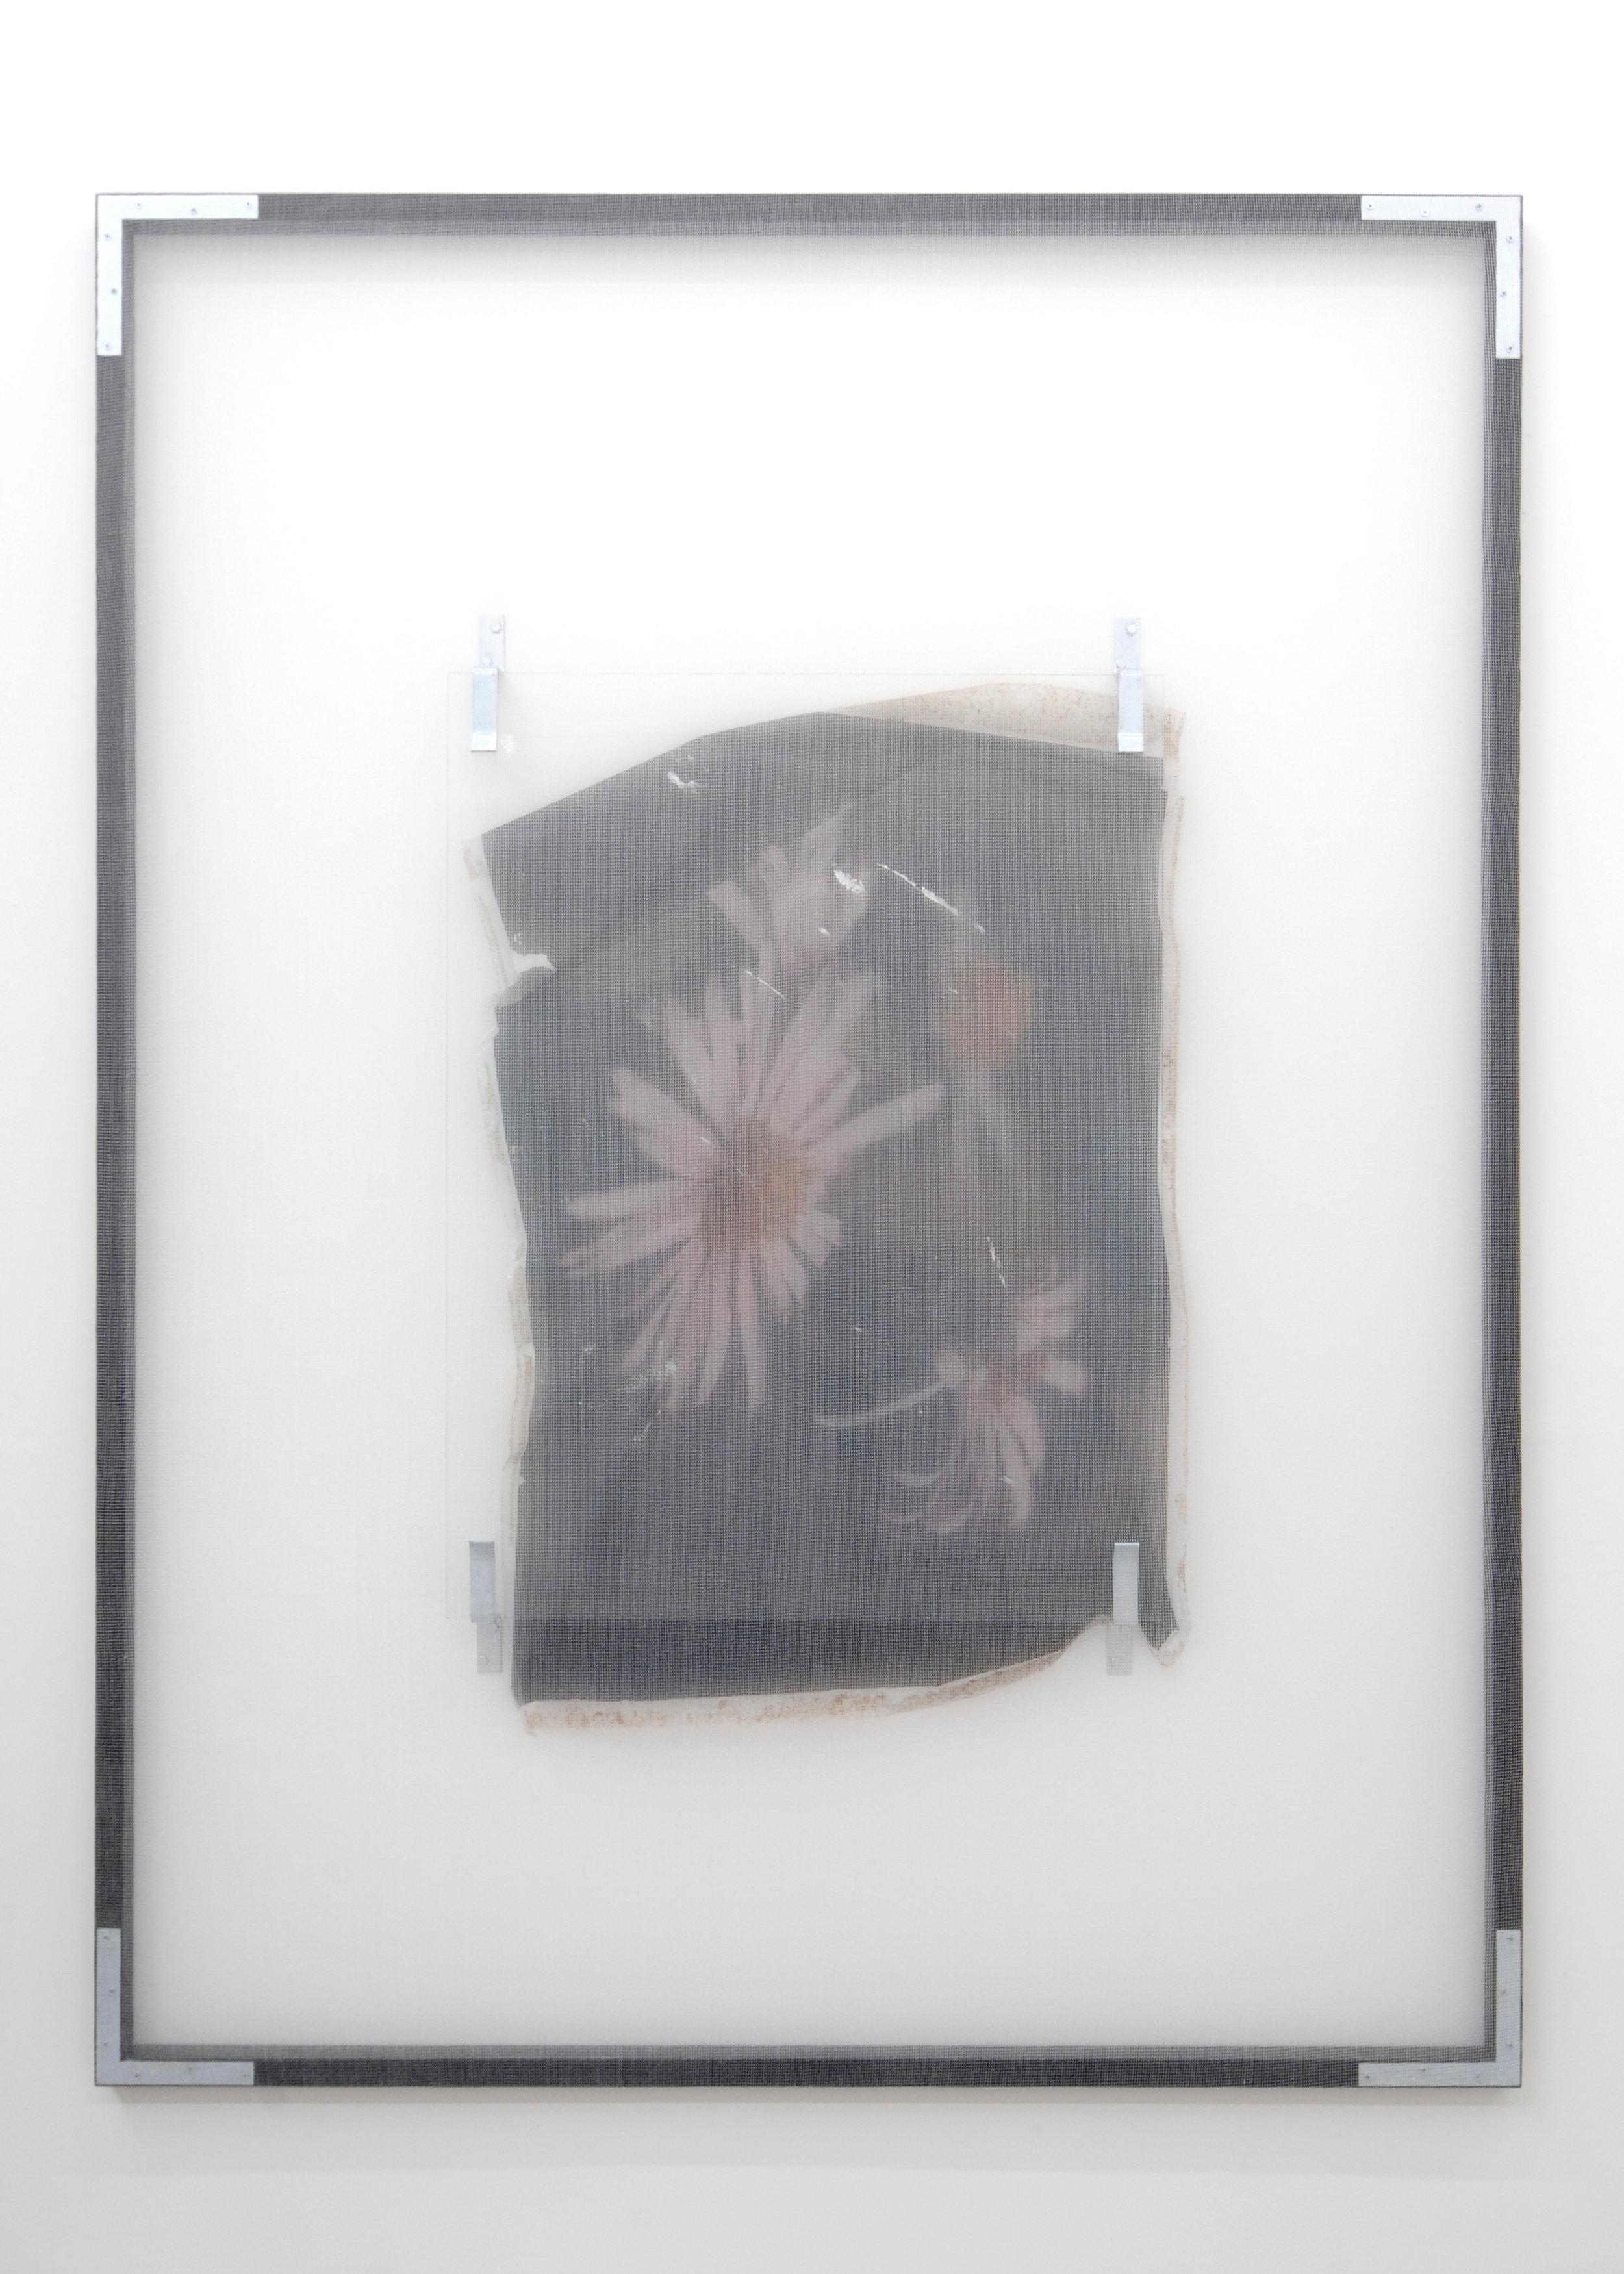 Patricia's Flower , 2013, debris netting, partially removed mirror, peeled print on plastic, door barricade brackets, wood, hardware, permanent marker, 244 x 183 cm